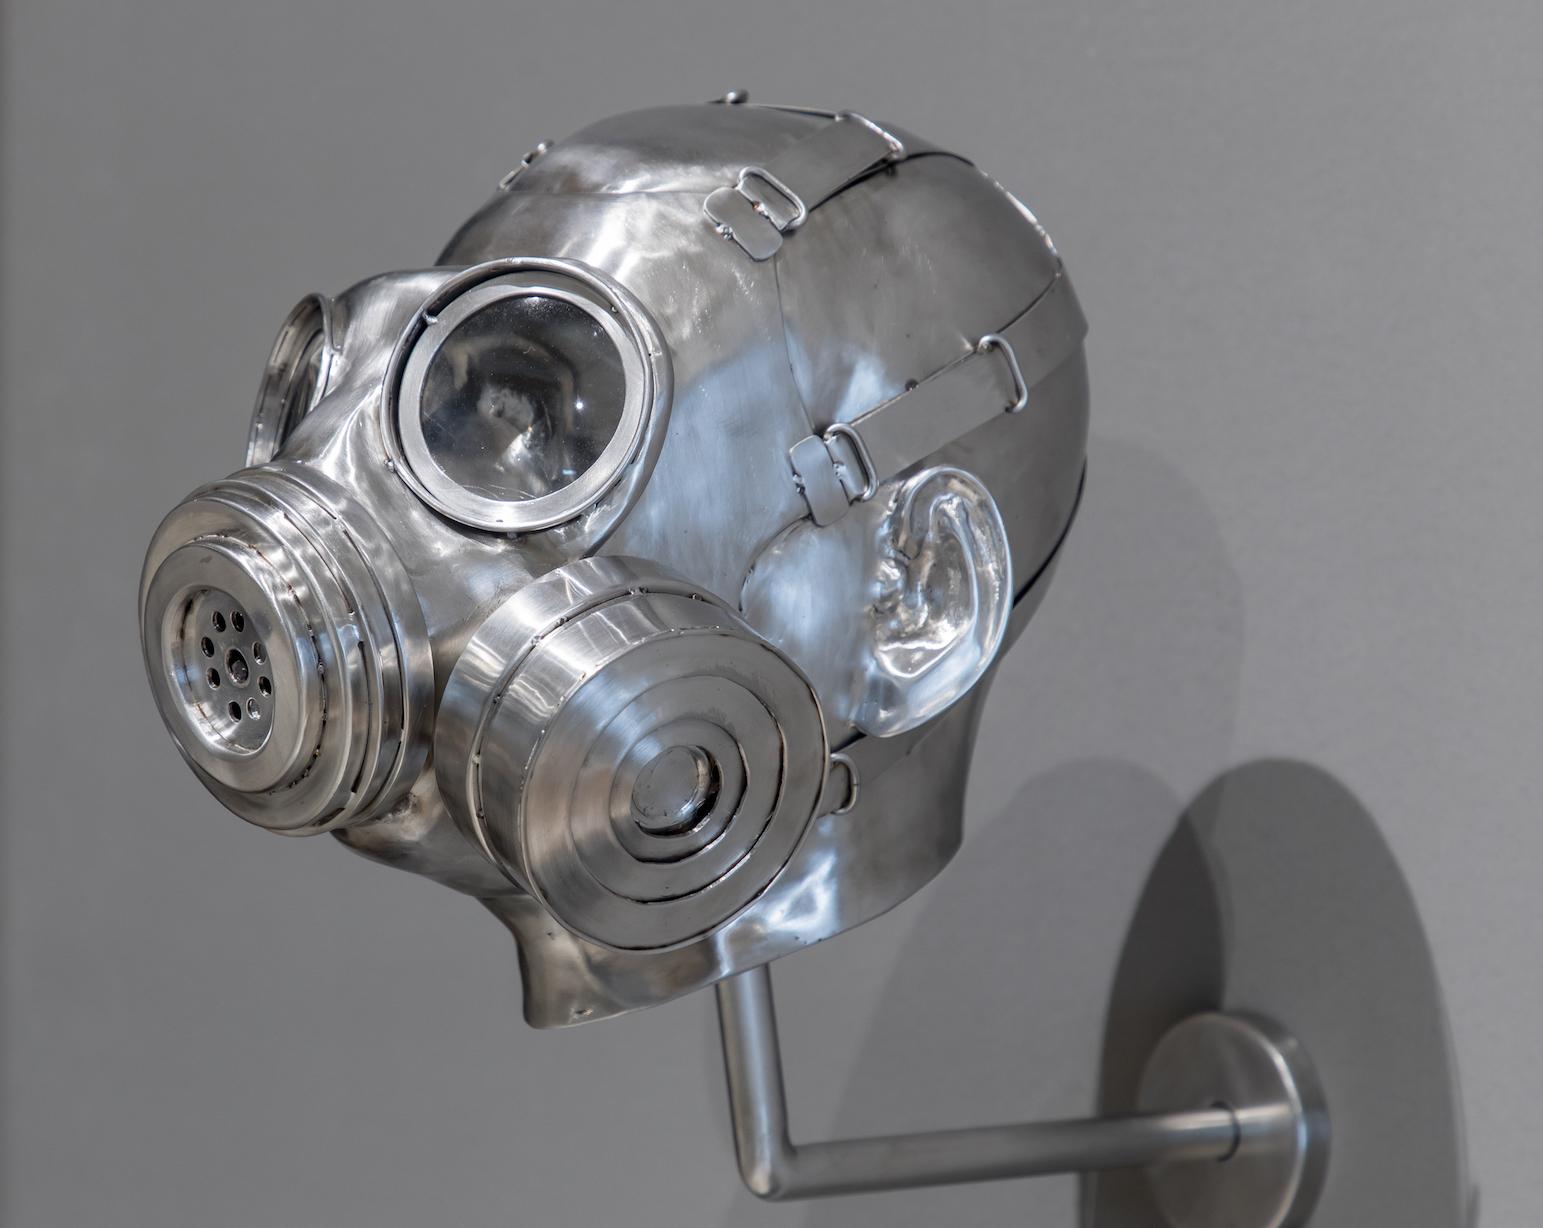 Mahbubur Rahman ,Man with gas mask, stainless steel